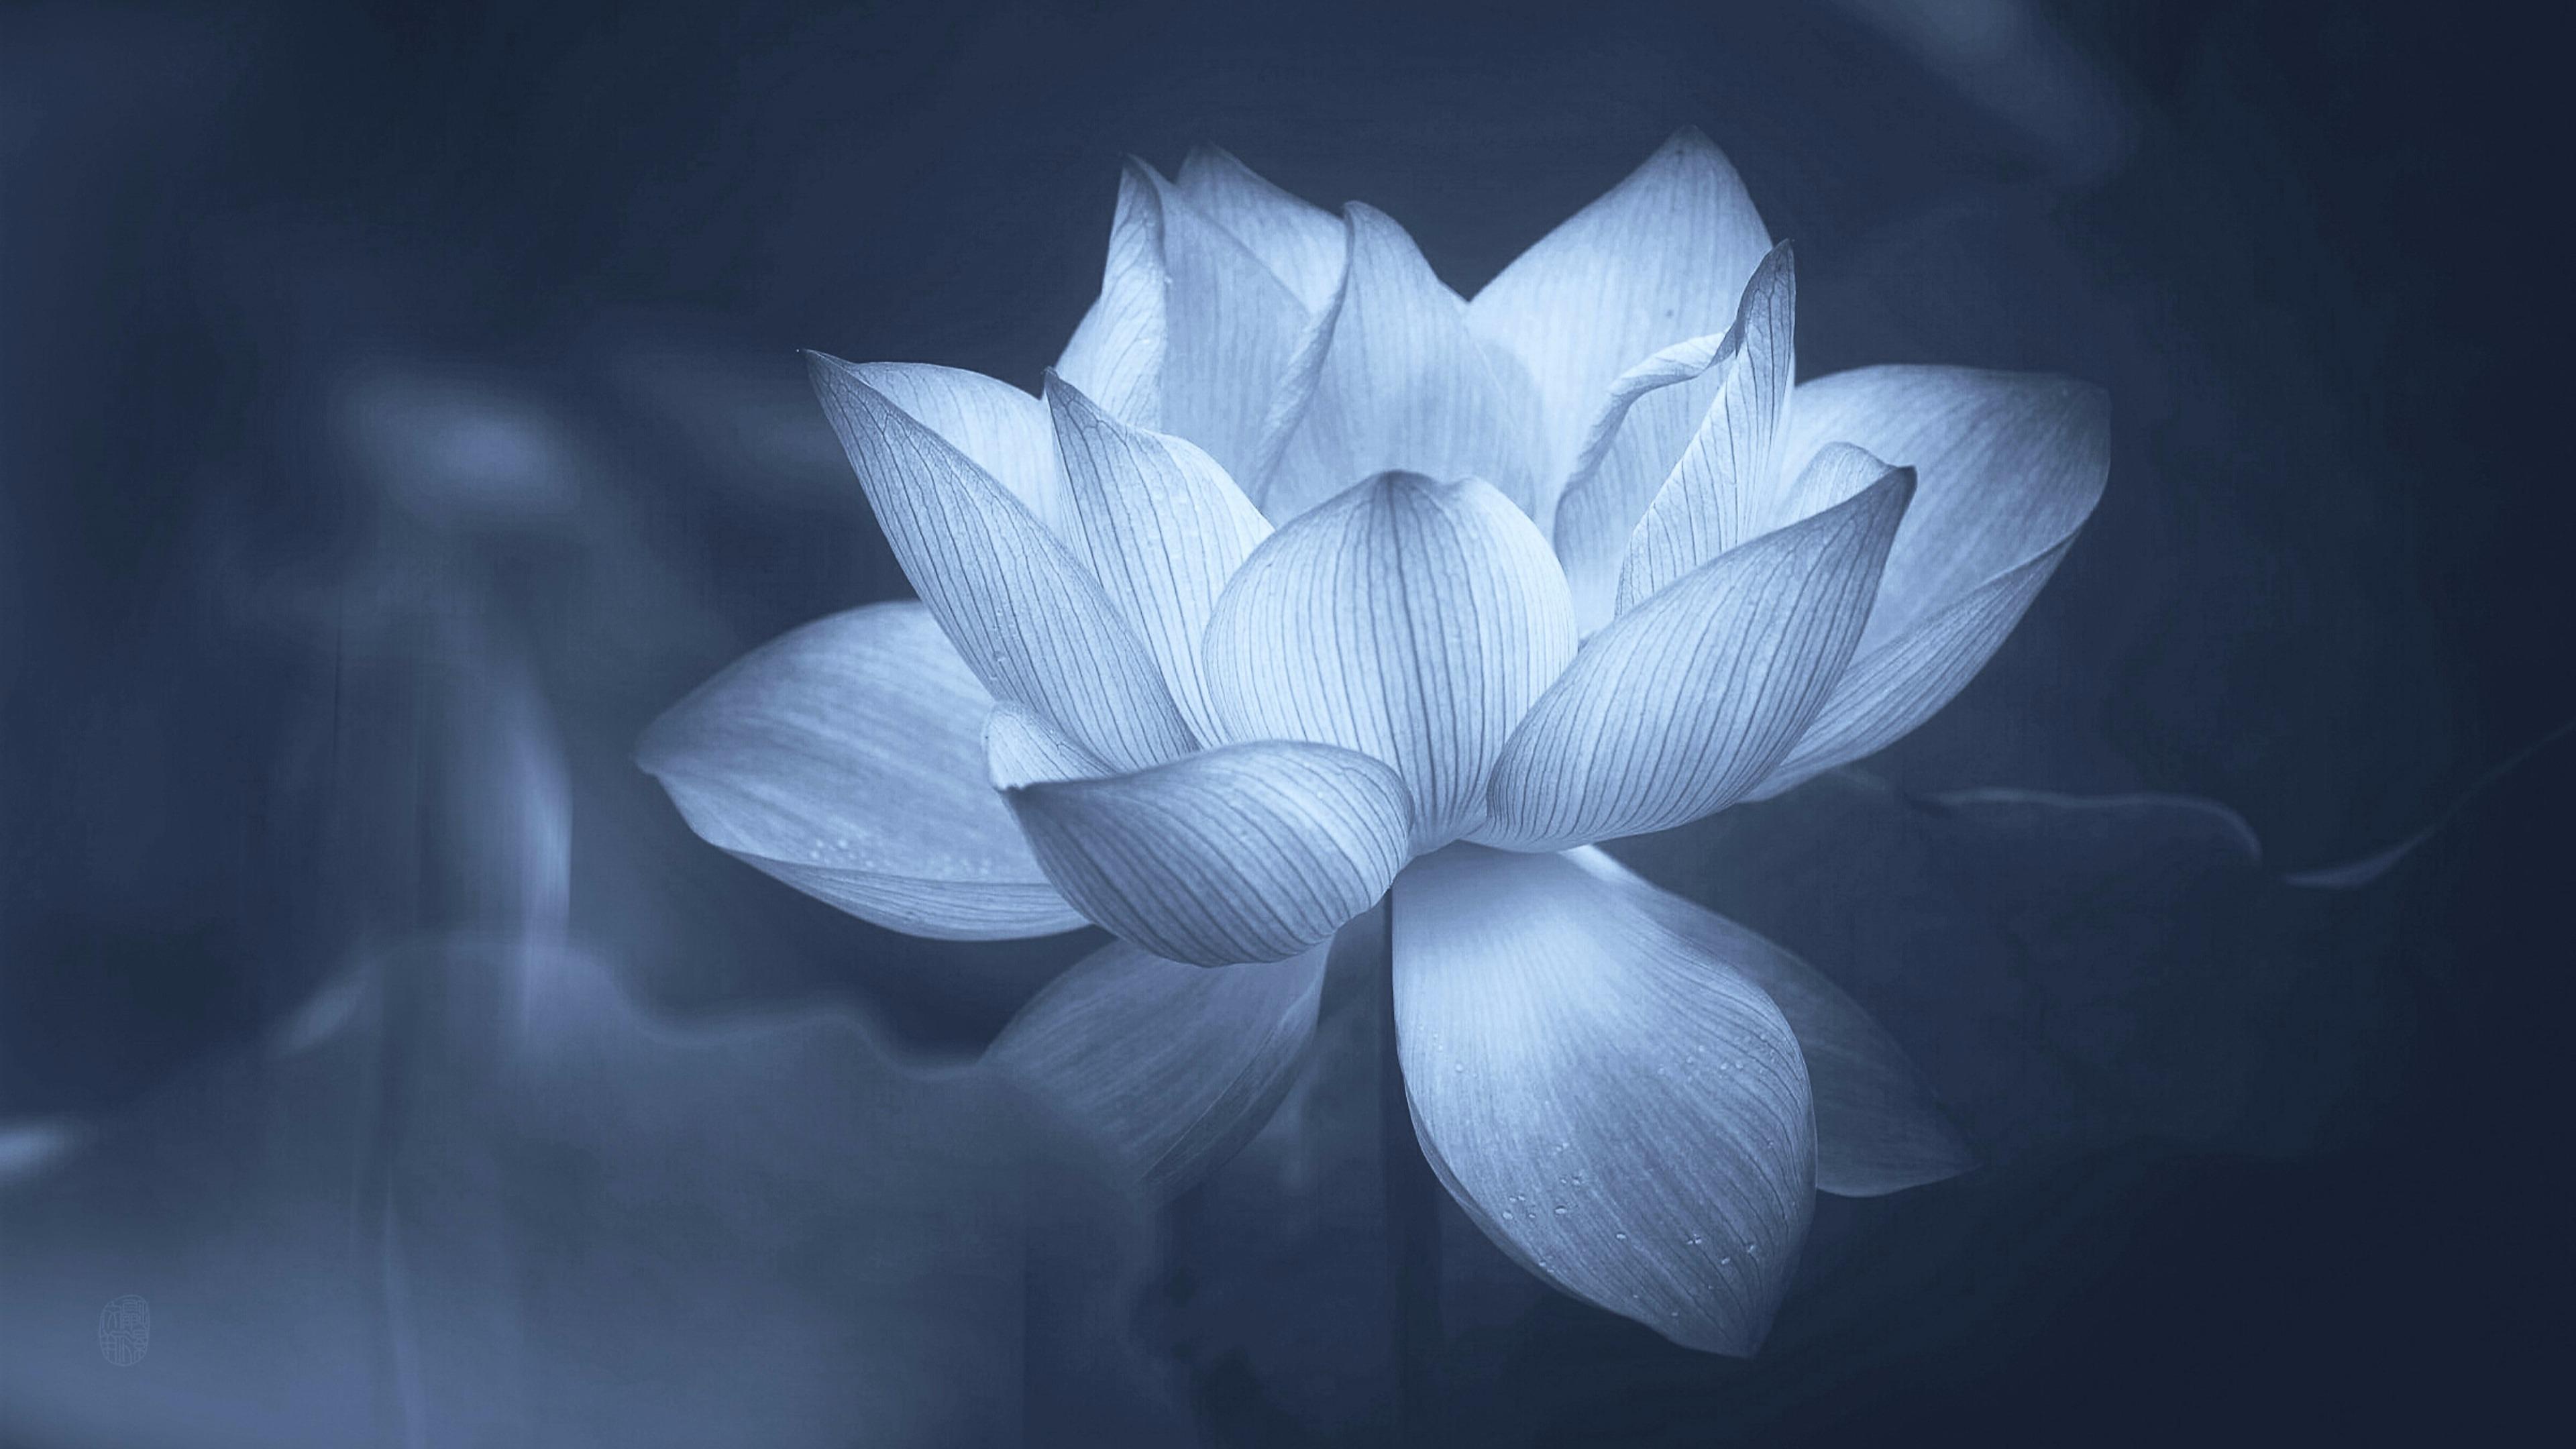 Black And White Lotus Desktop Wallpapers Top Free Black And White Lotus Desktop Backgrounds Wallpaperaccess